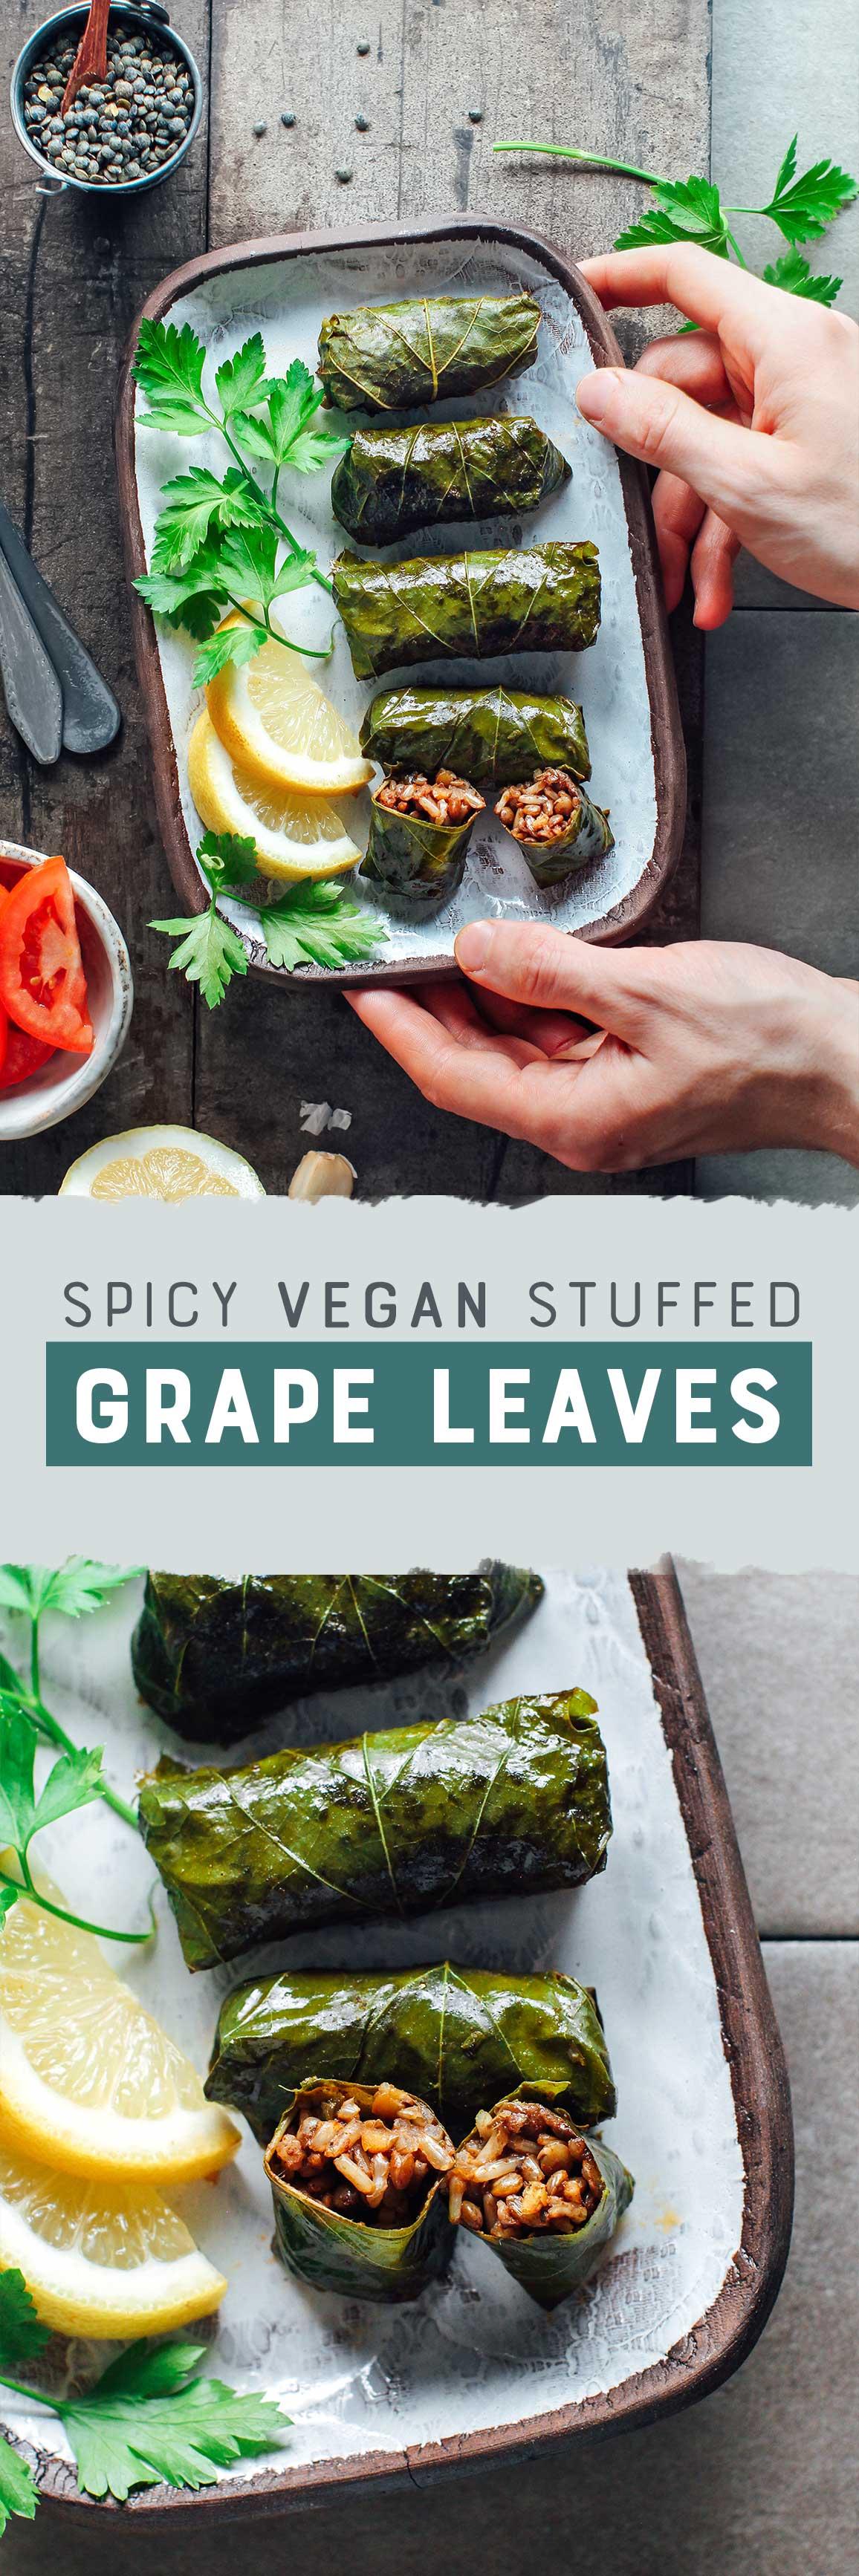 Spicy Vegan Stuffed Grape Leaves